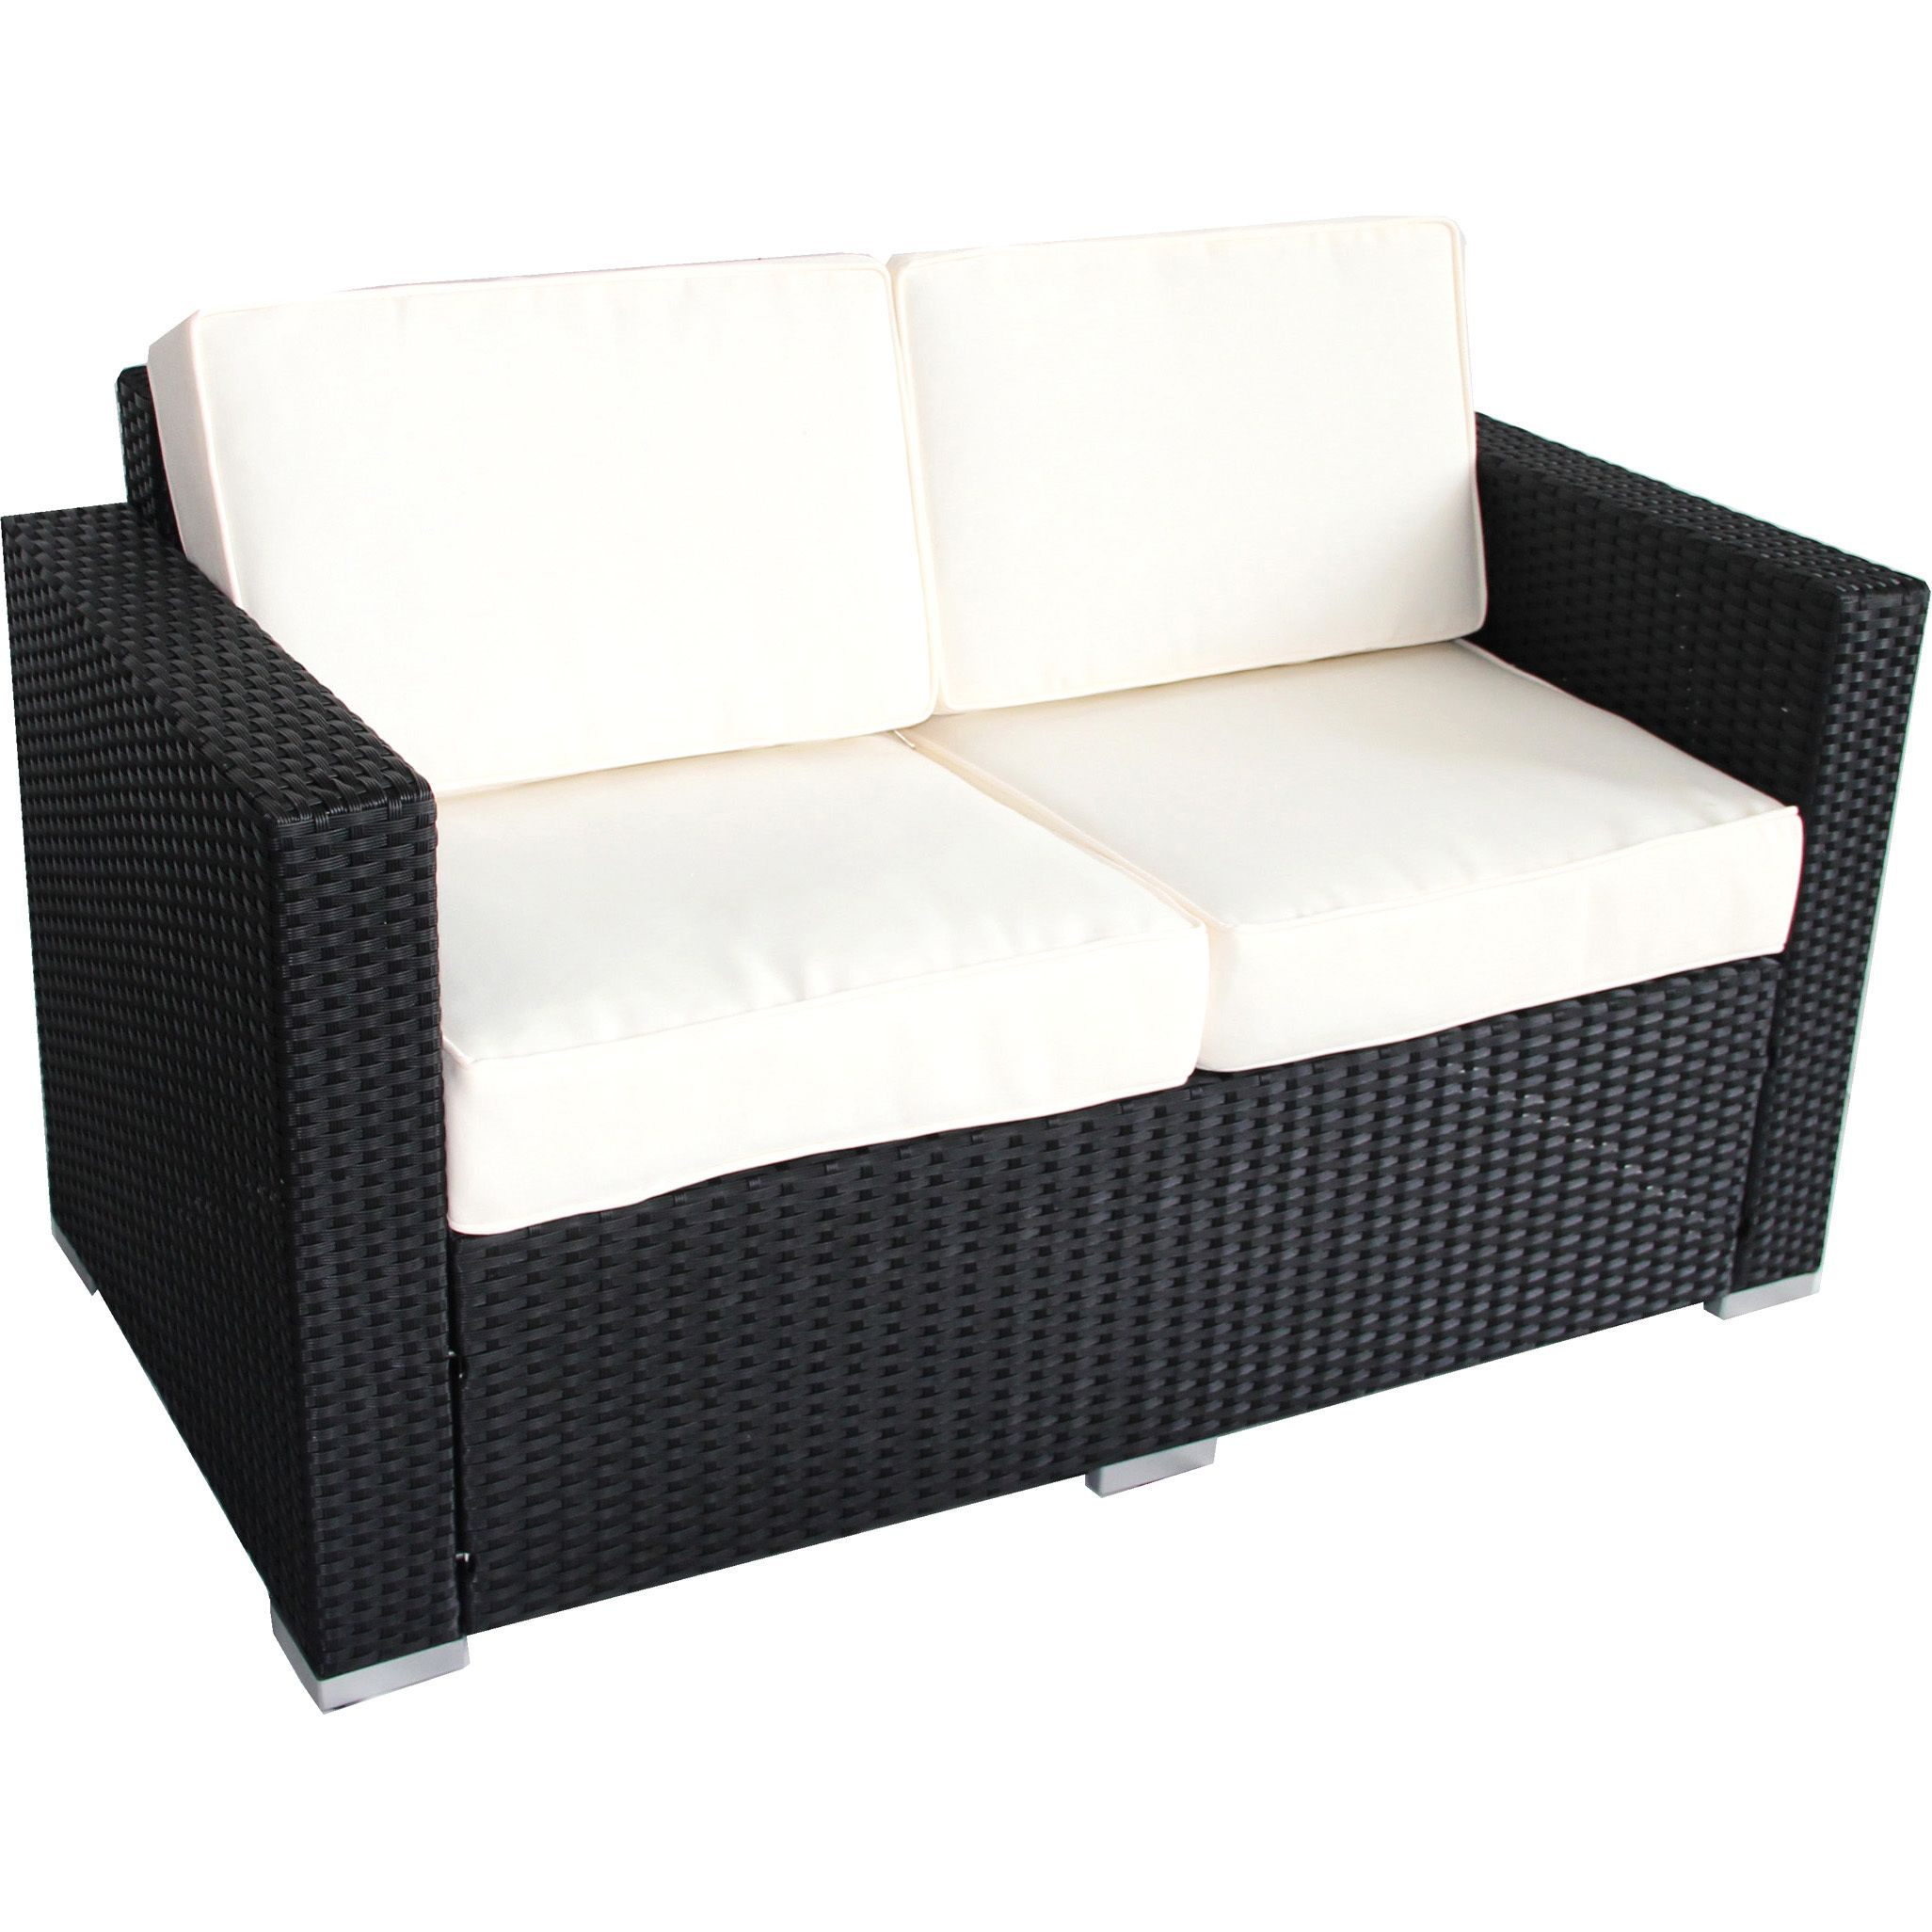 BroyerK 4 Piece Outdoor Rattan Patio Furniture Set By BroyerK